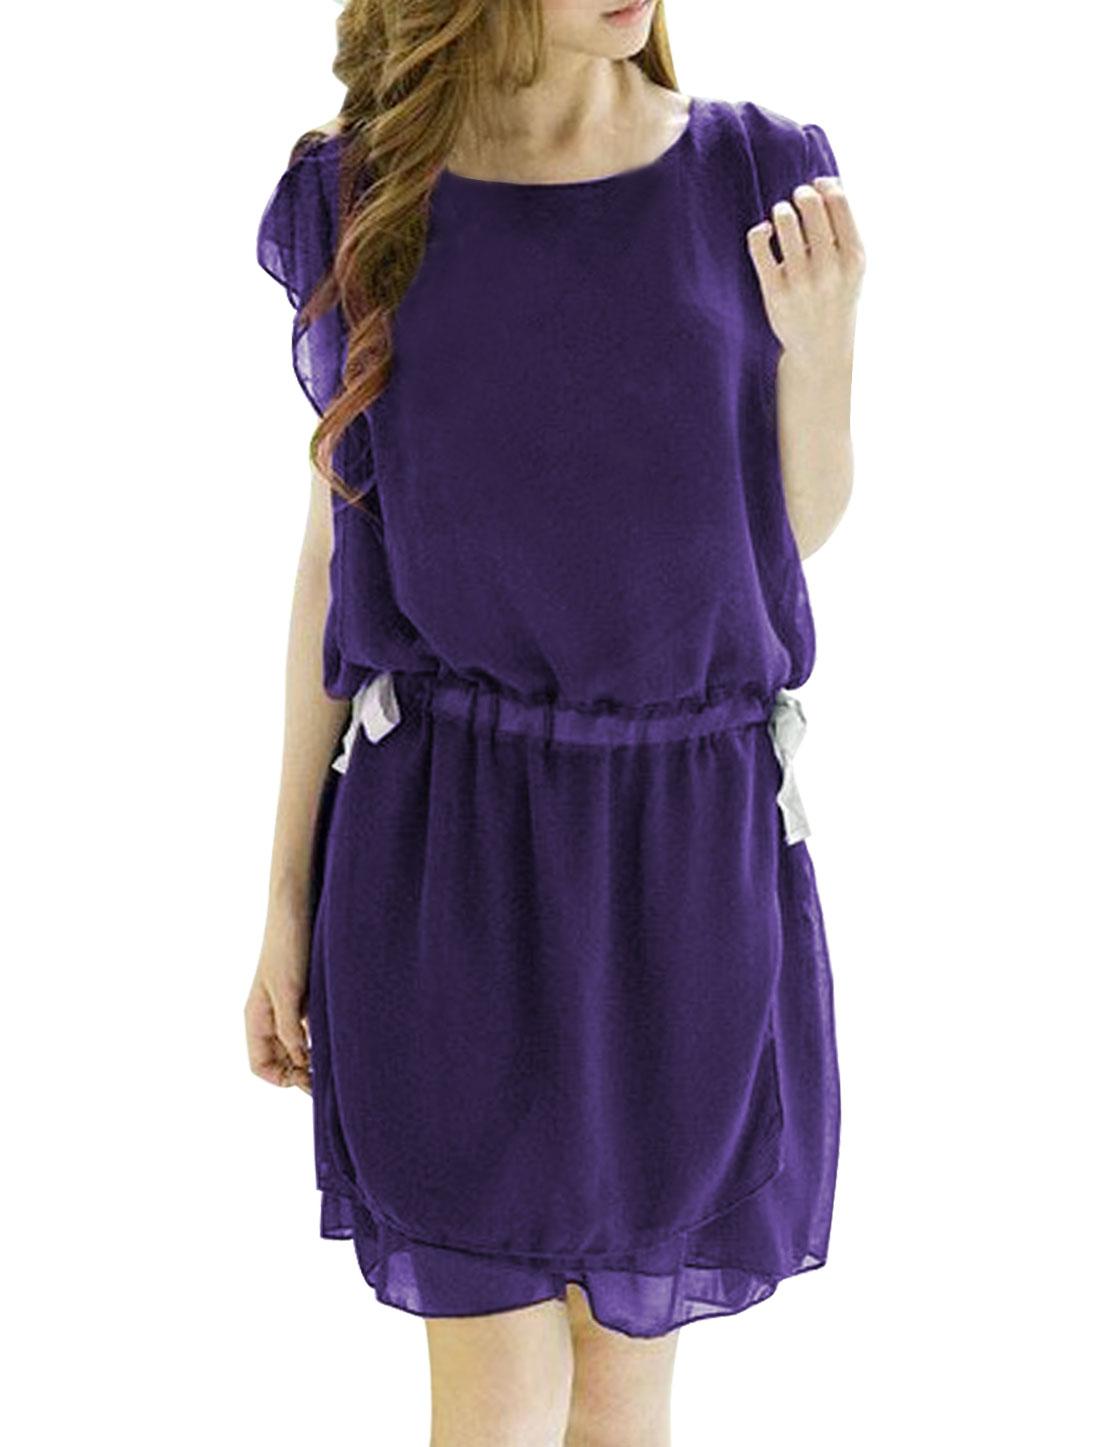 Lady Purple Round Neck Self Tie String Tiered Summer Dress L